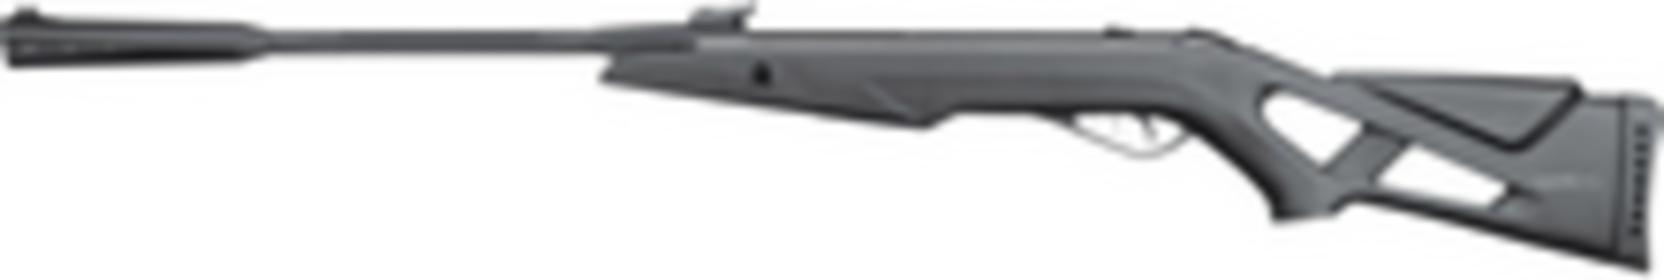 Gamo karabinek Whisper IGT 4,5 mm